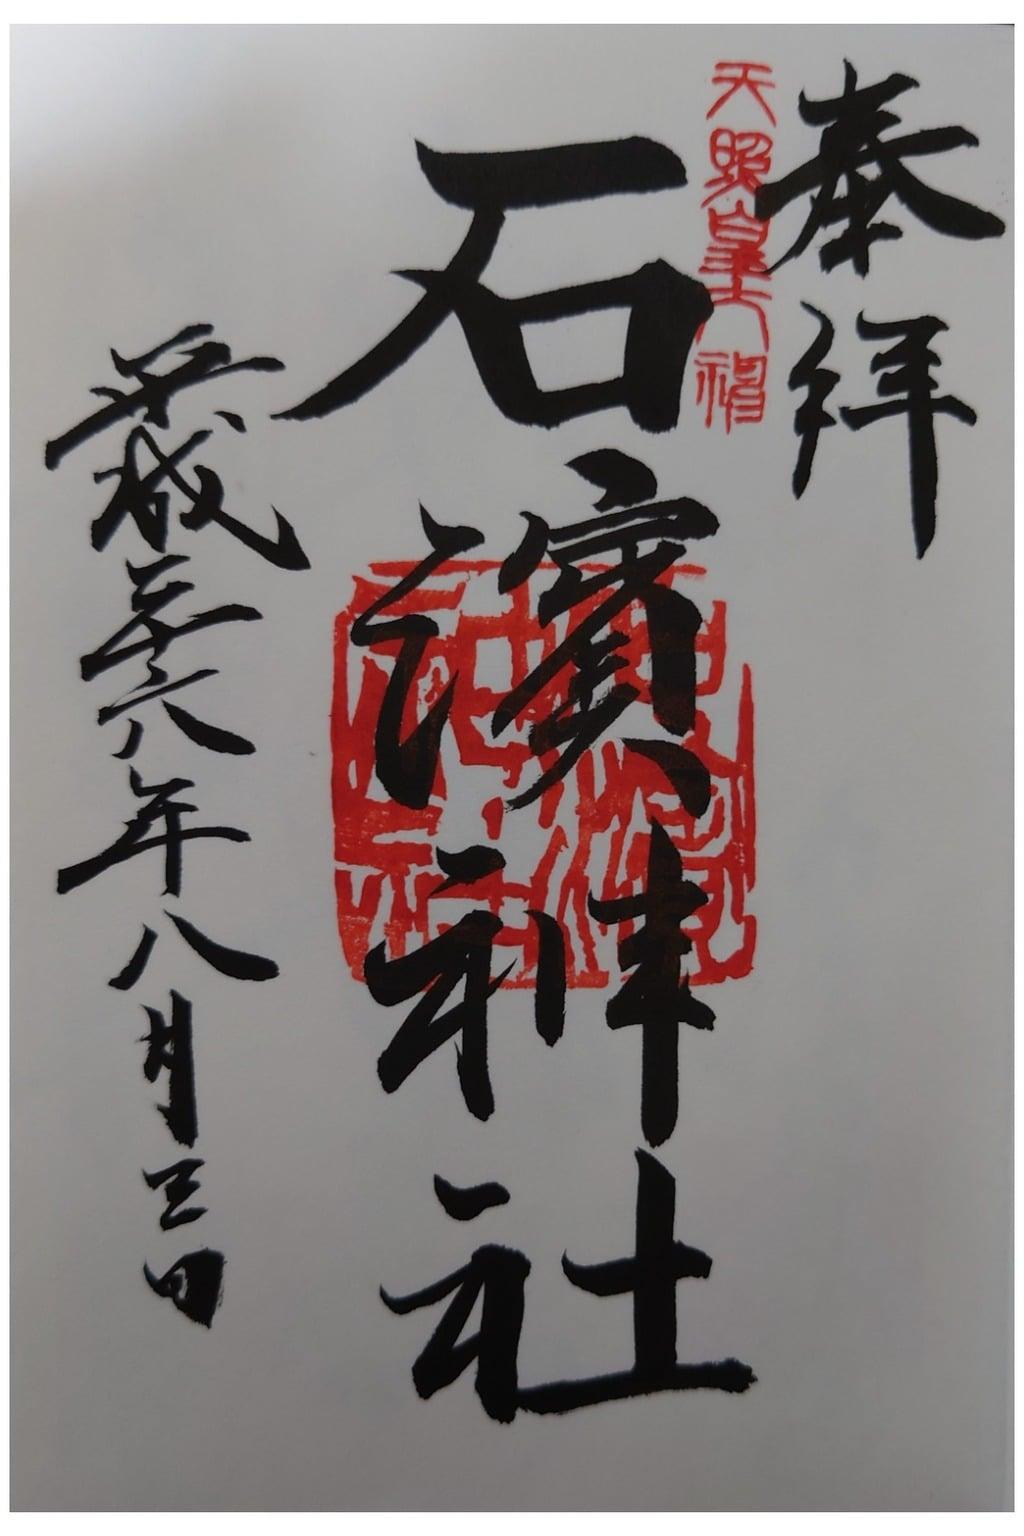 石濱神社の御朱印